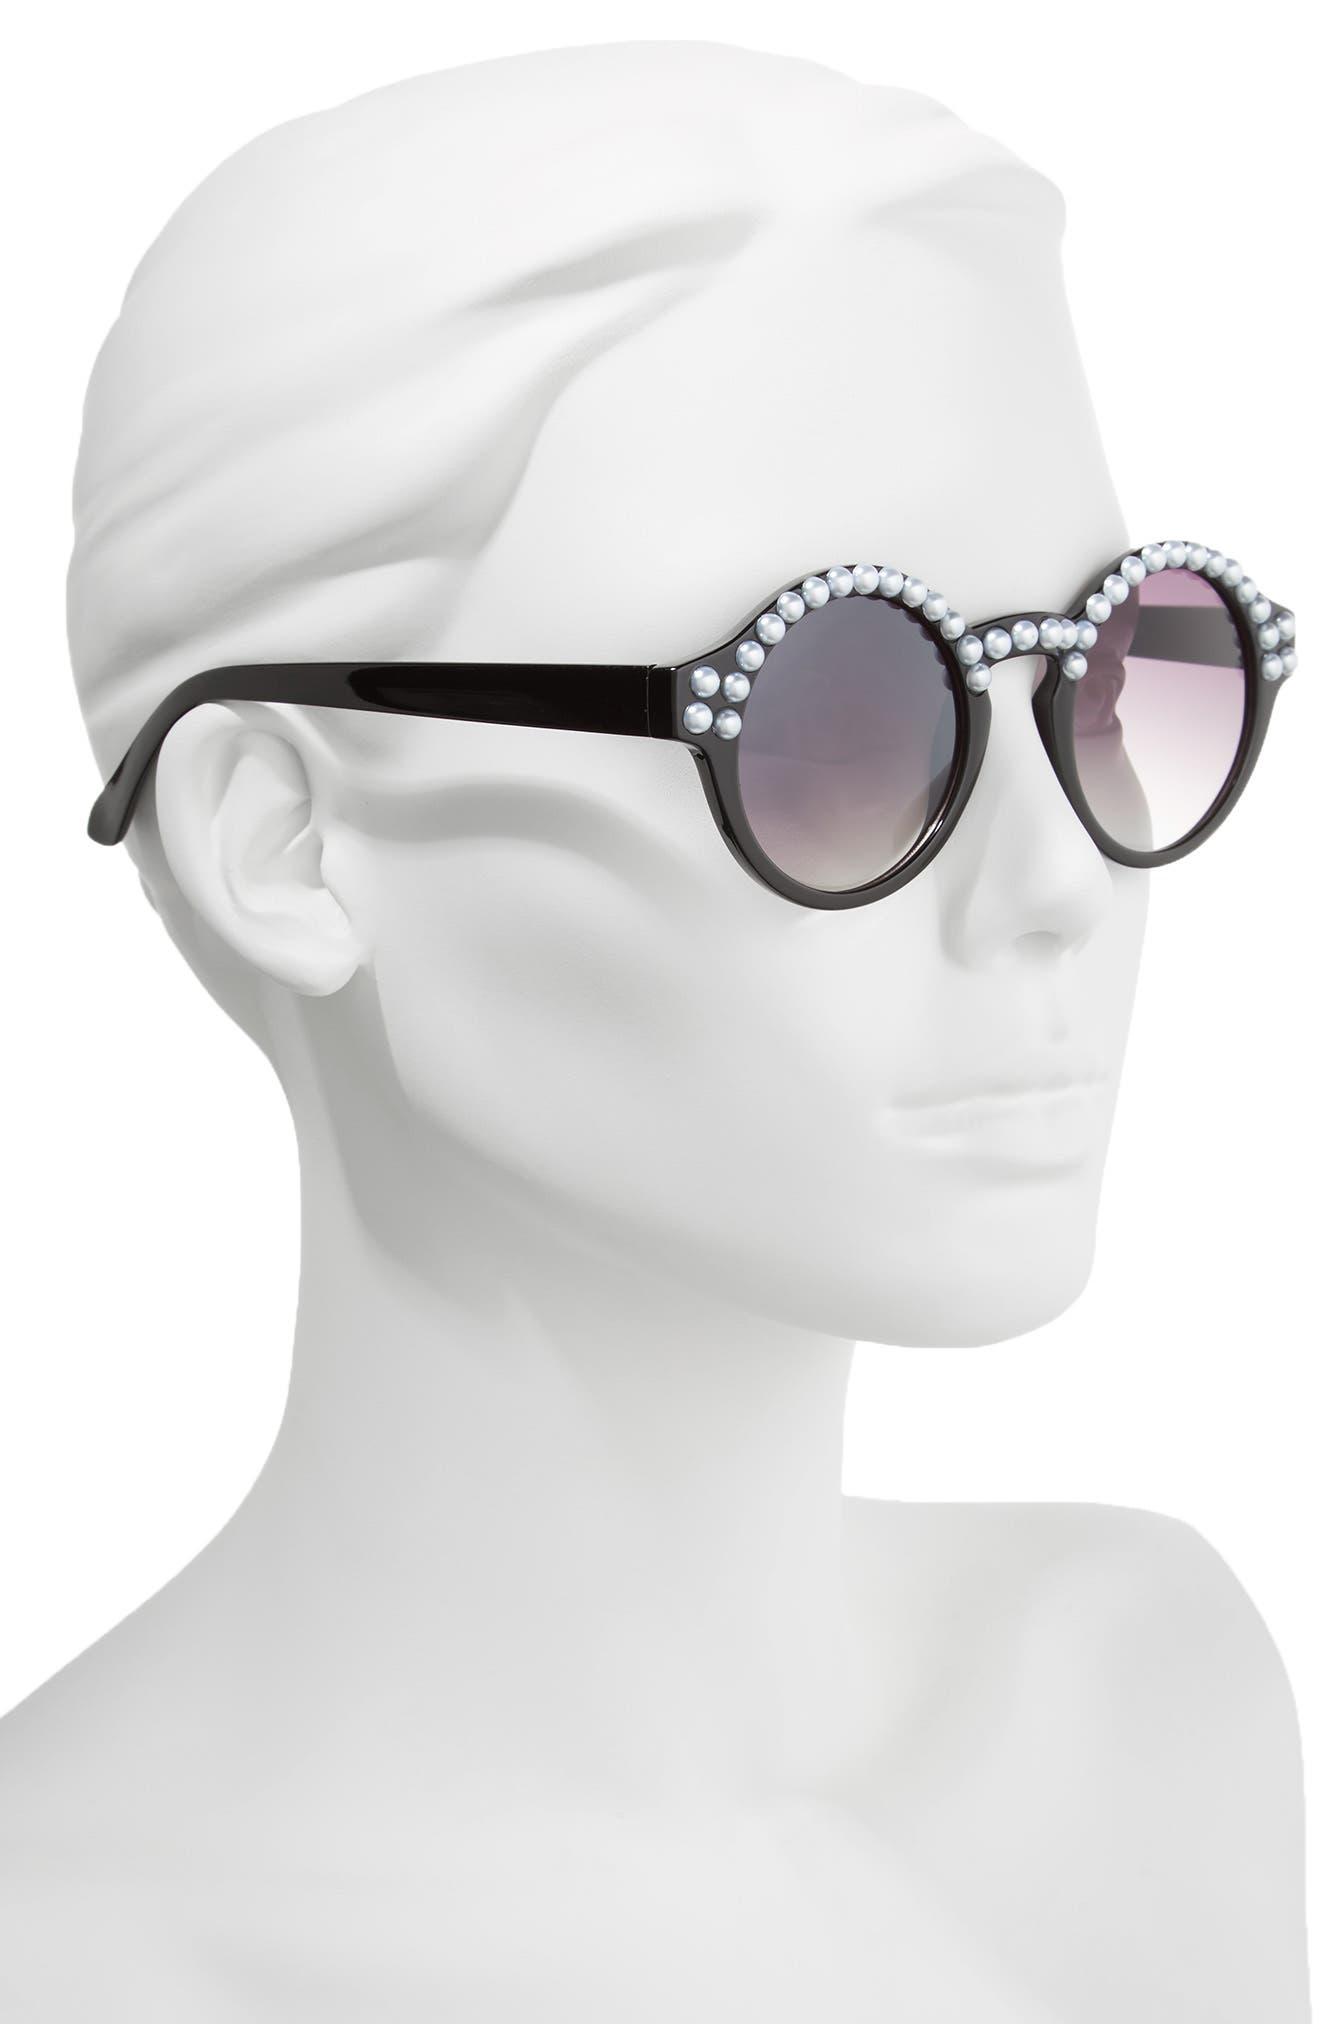 45mm Imitation Pearl Round Sunglasses,                             Alternate thumbnail 2, color,                             002